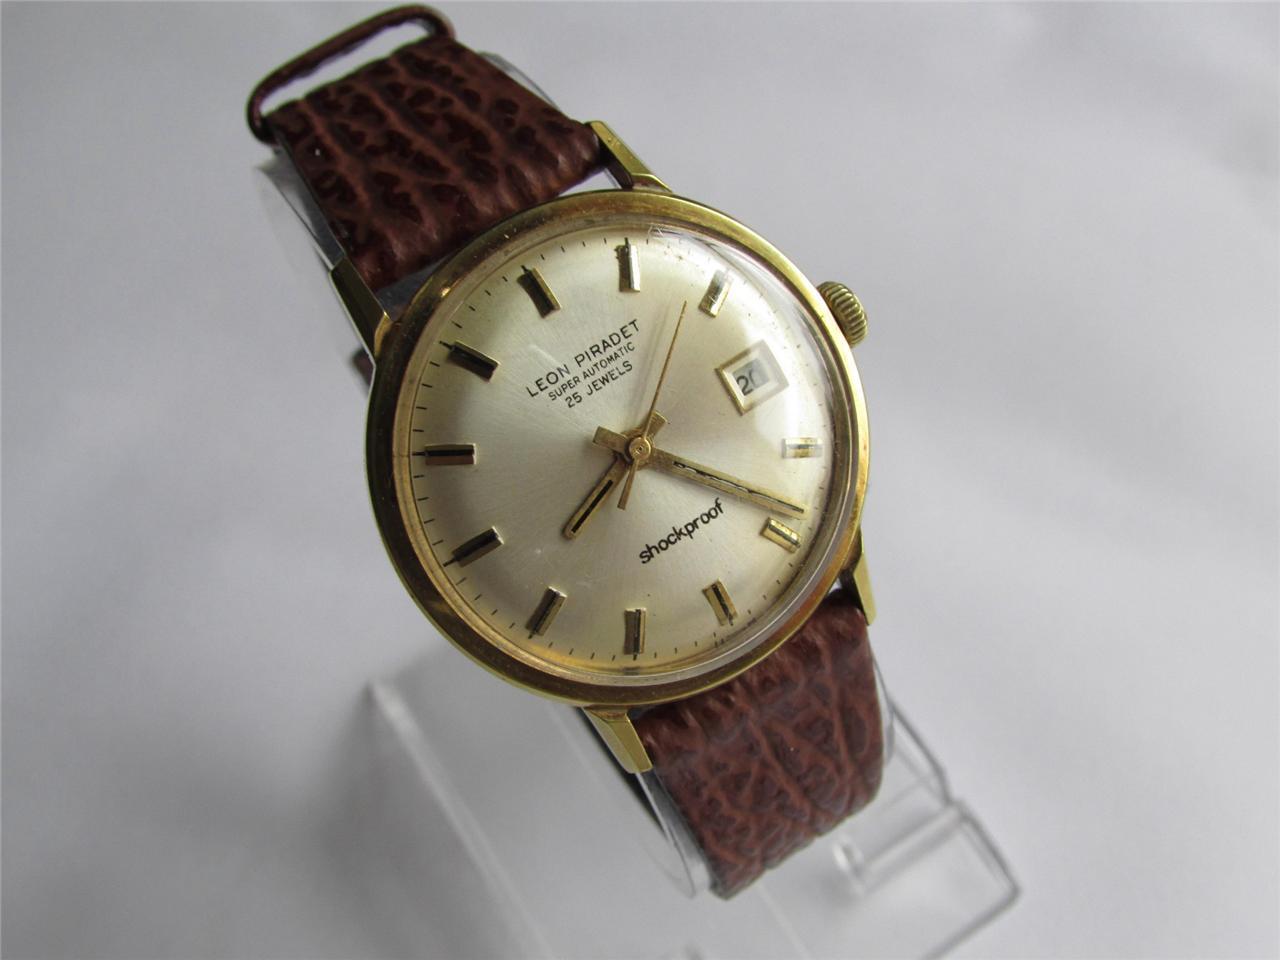 Marques d'emprunt ou d'exportation des montres soviétiques 700431452_o